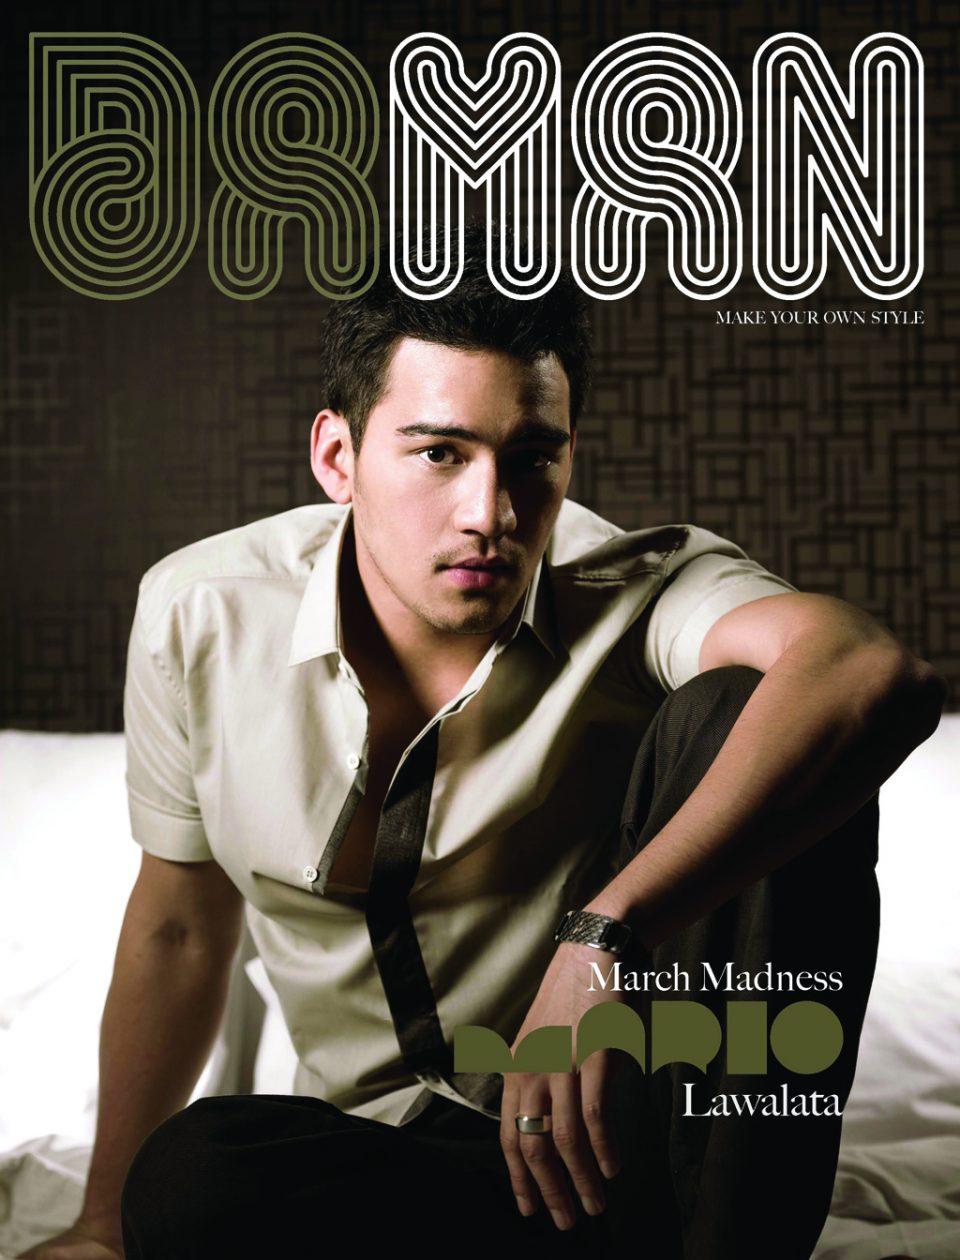 Cover DA MAN Mar 2008